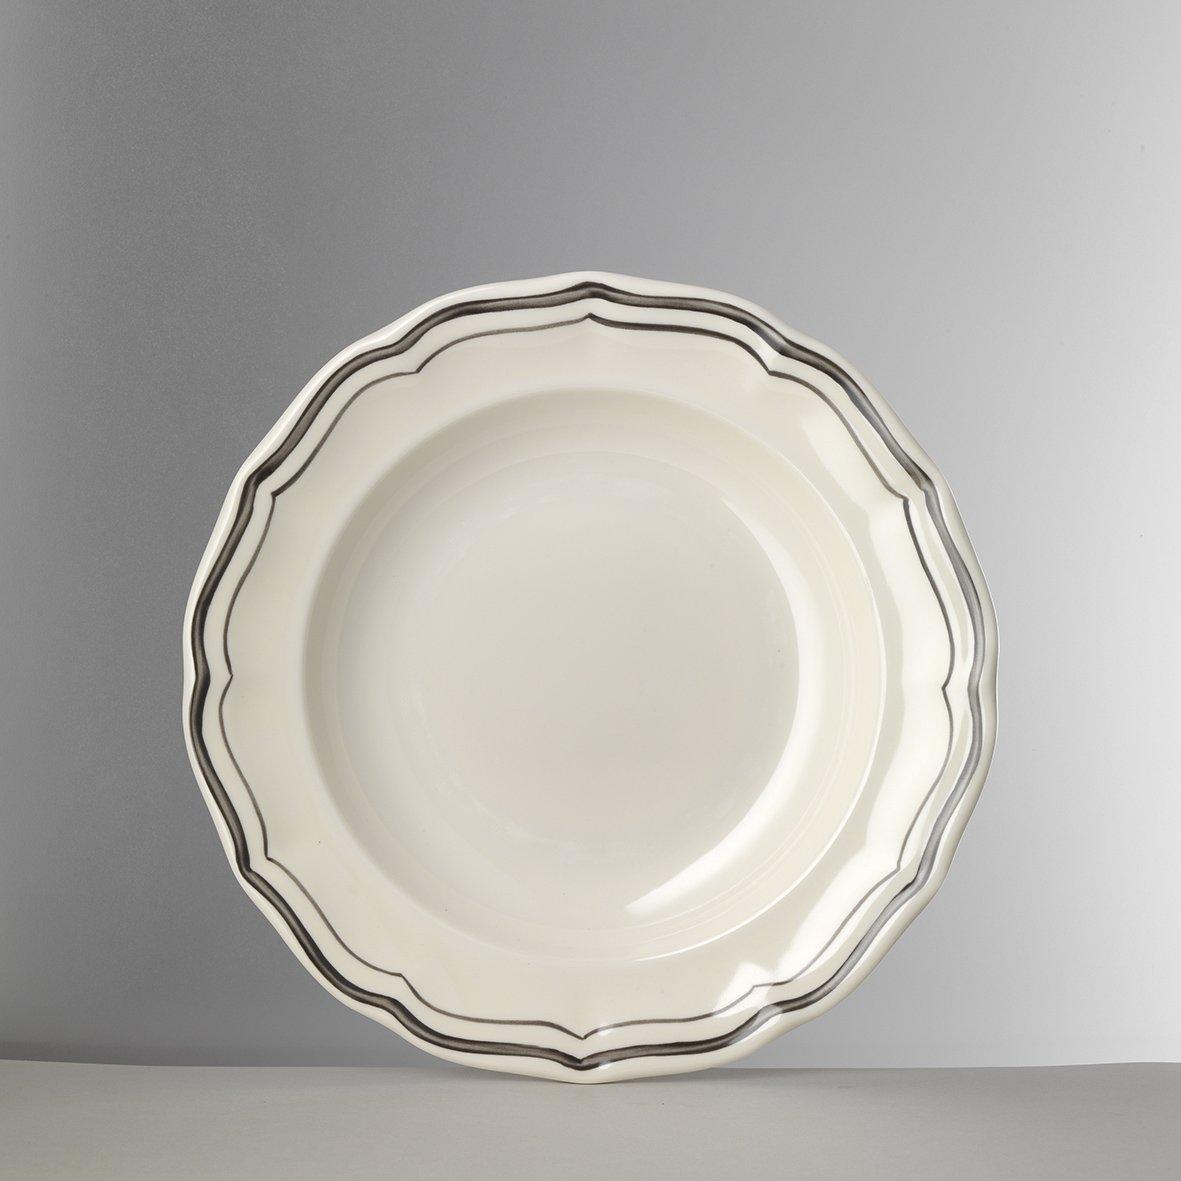 Mario Luca Giusti Set 6 Miranda Dessert Plate White/Grey